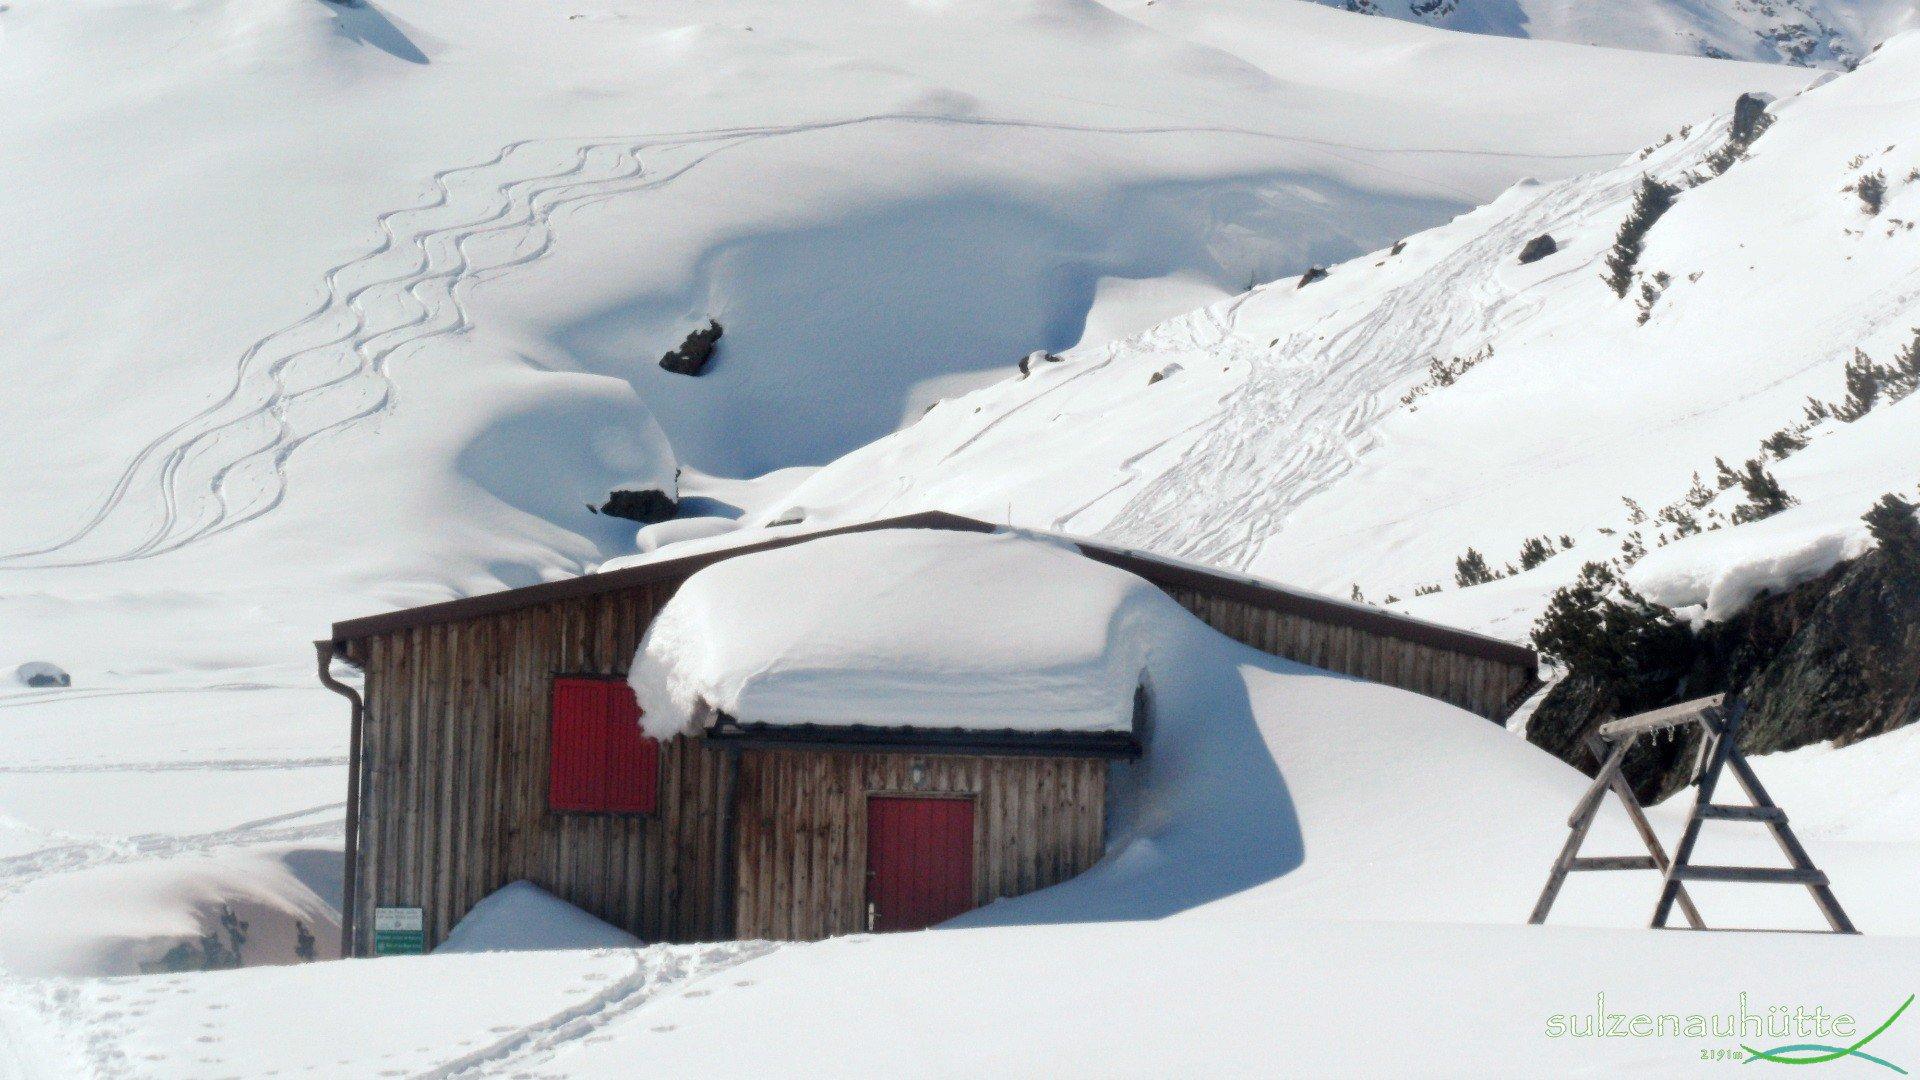 Sulzenauhuette, Stubaier Hoehenweg